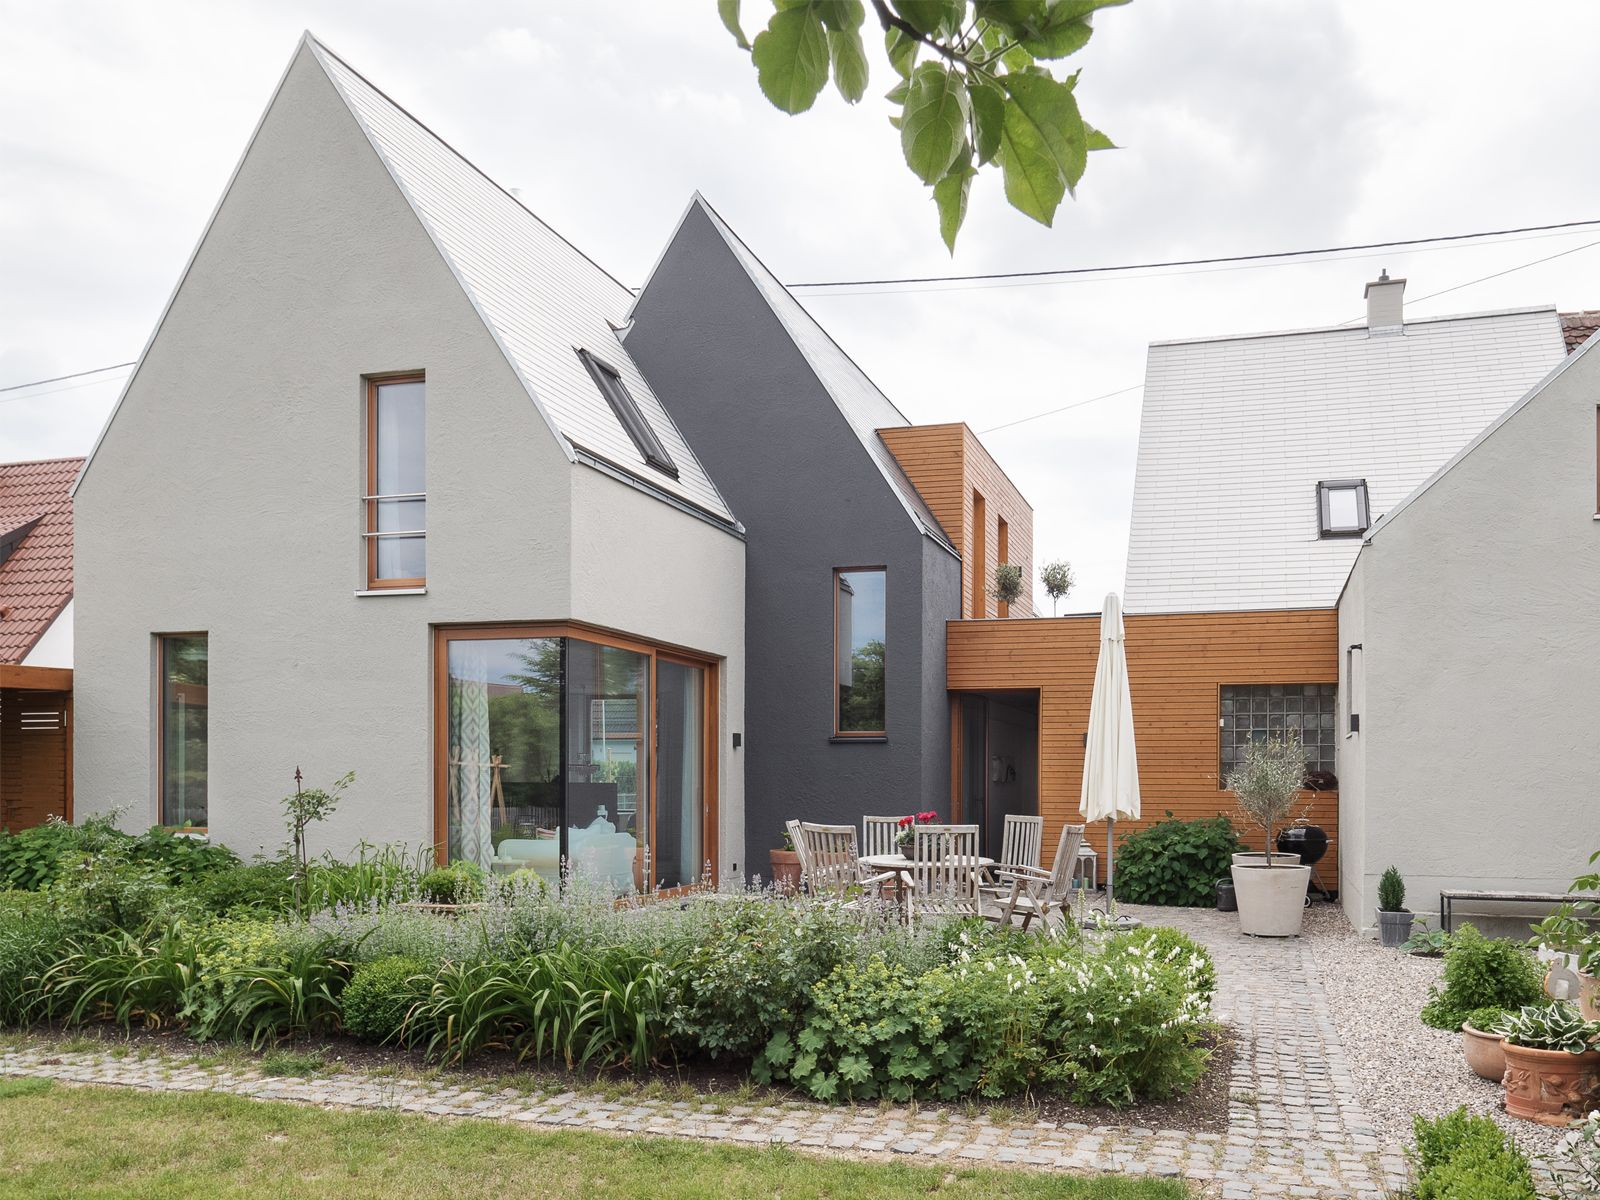 Haus Stero I studio pitliberman